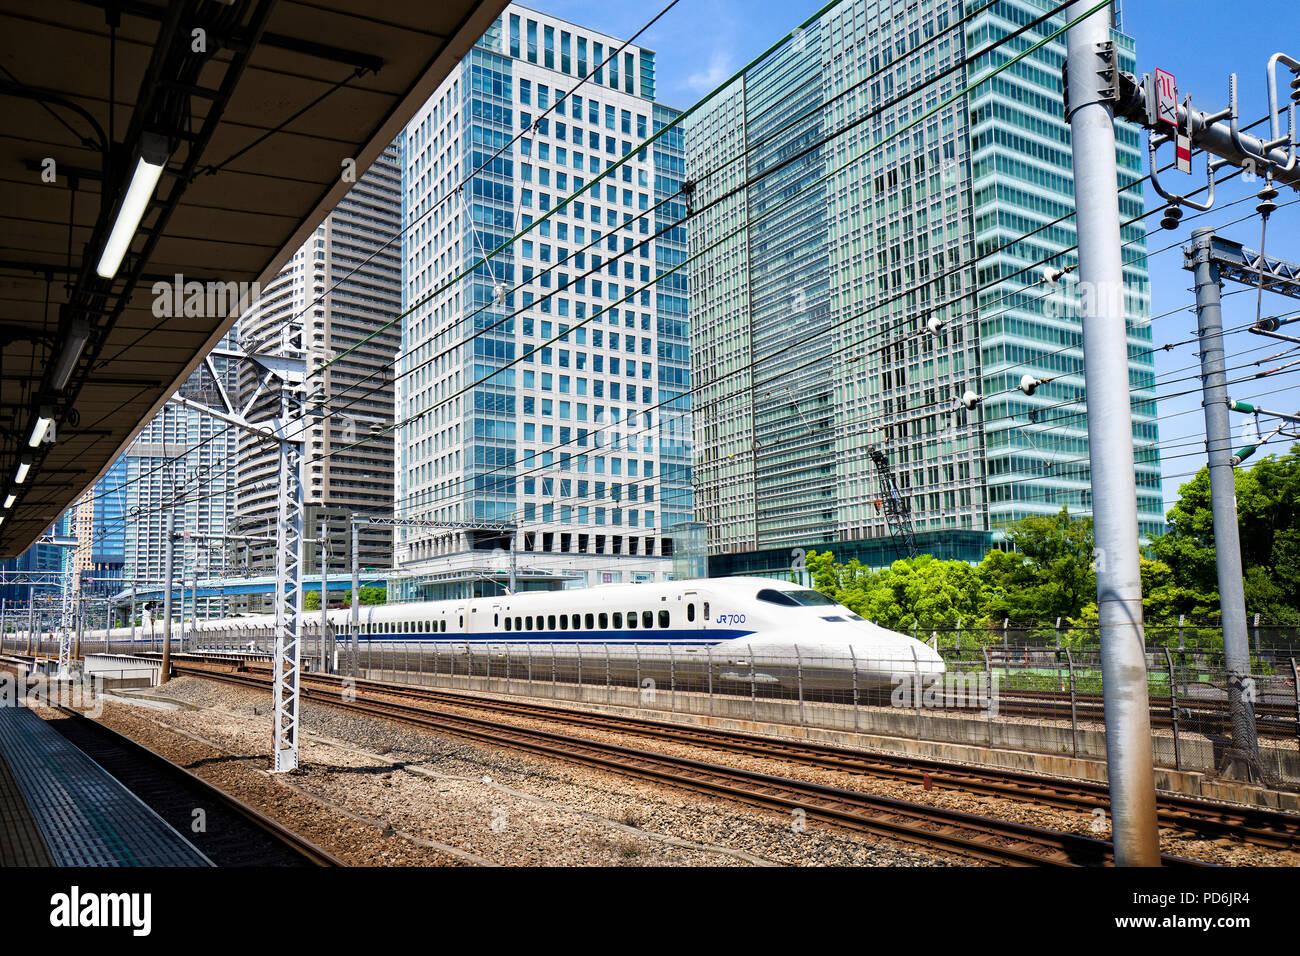 Japan, Insel Honshu, Kanto, Tokio, ein Shinkansen in Tokio. Stockfoto